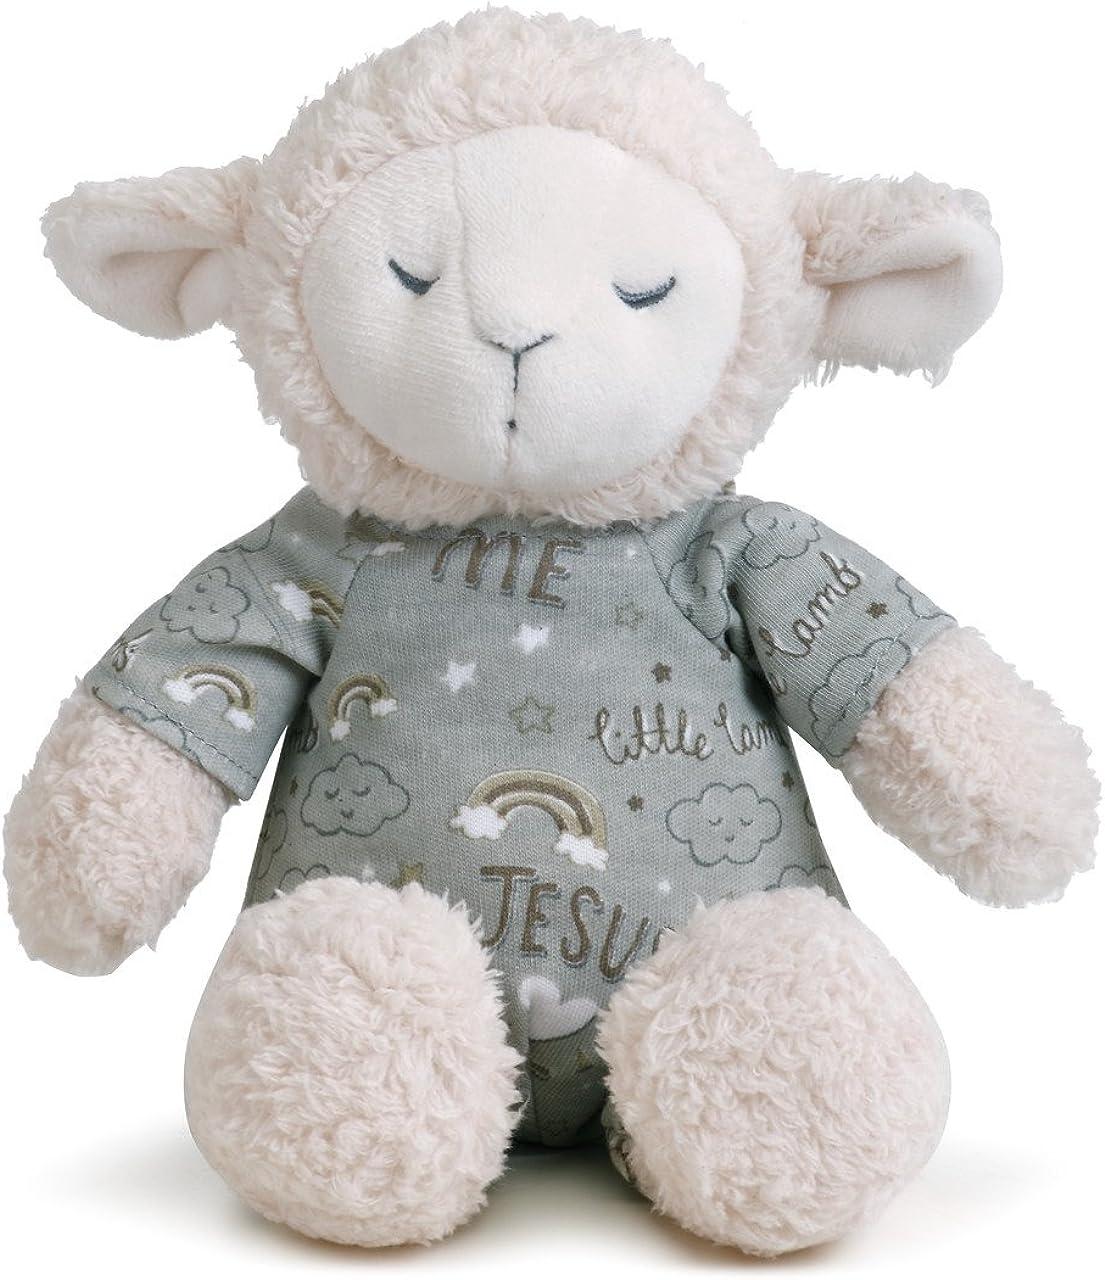 Babys 0-6 Months Cotton Plush 2 Piece Stuffed Animal /& Pajamas Set